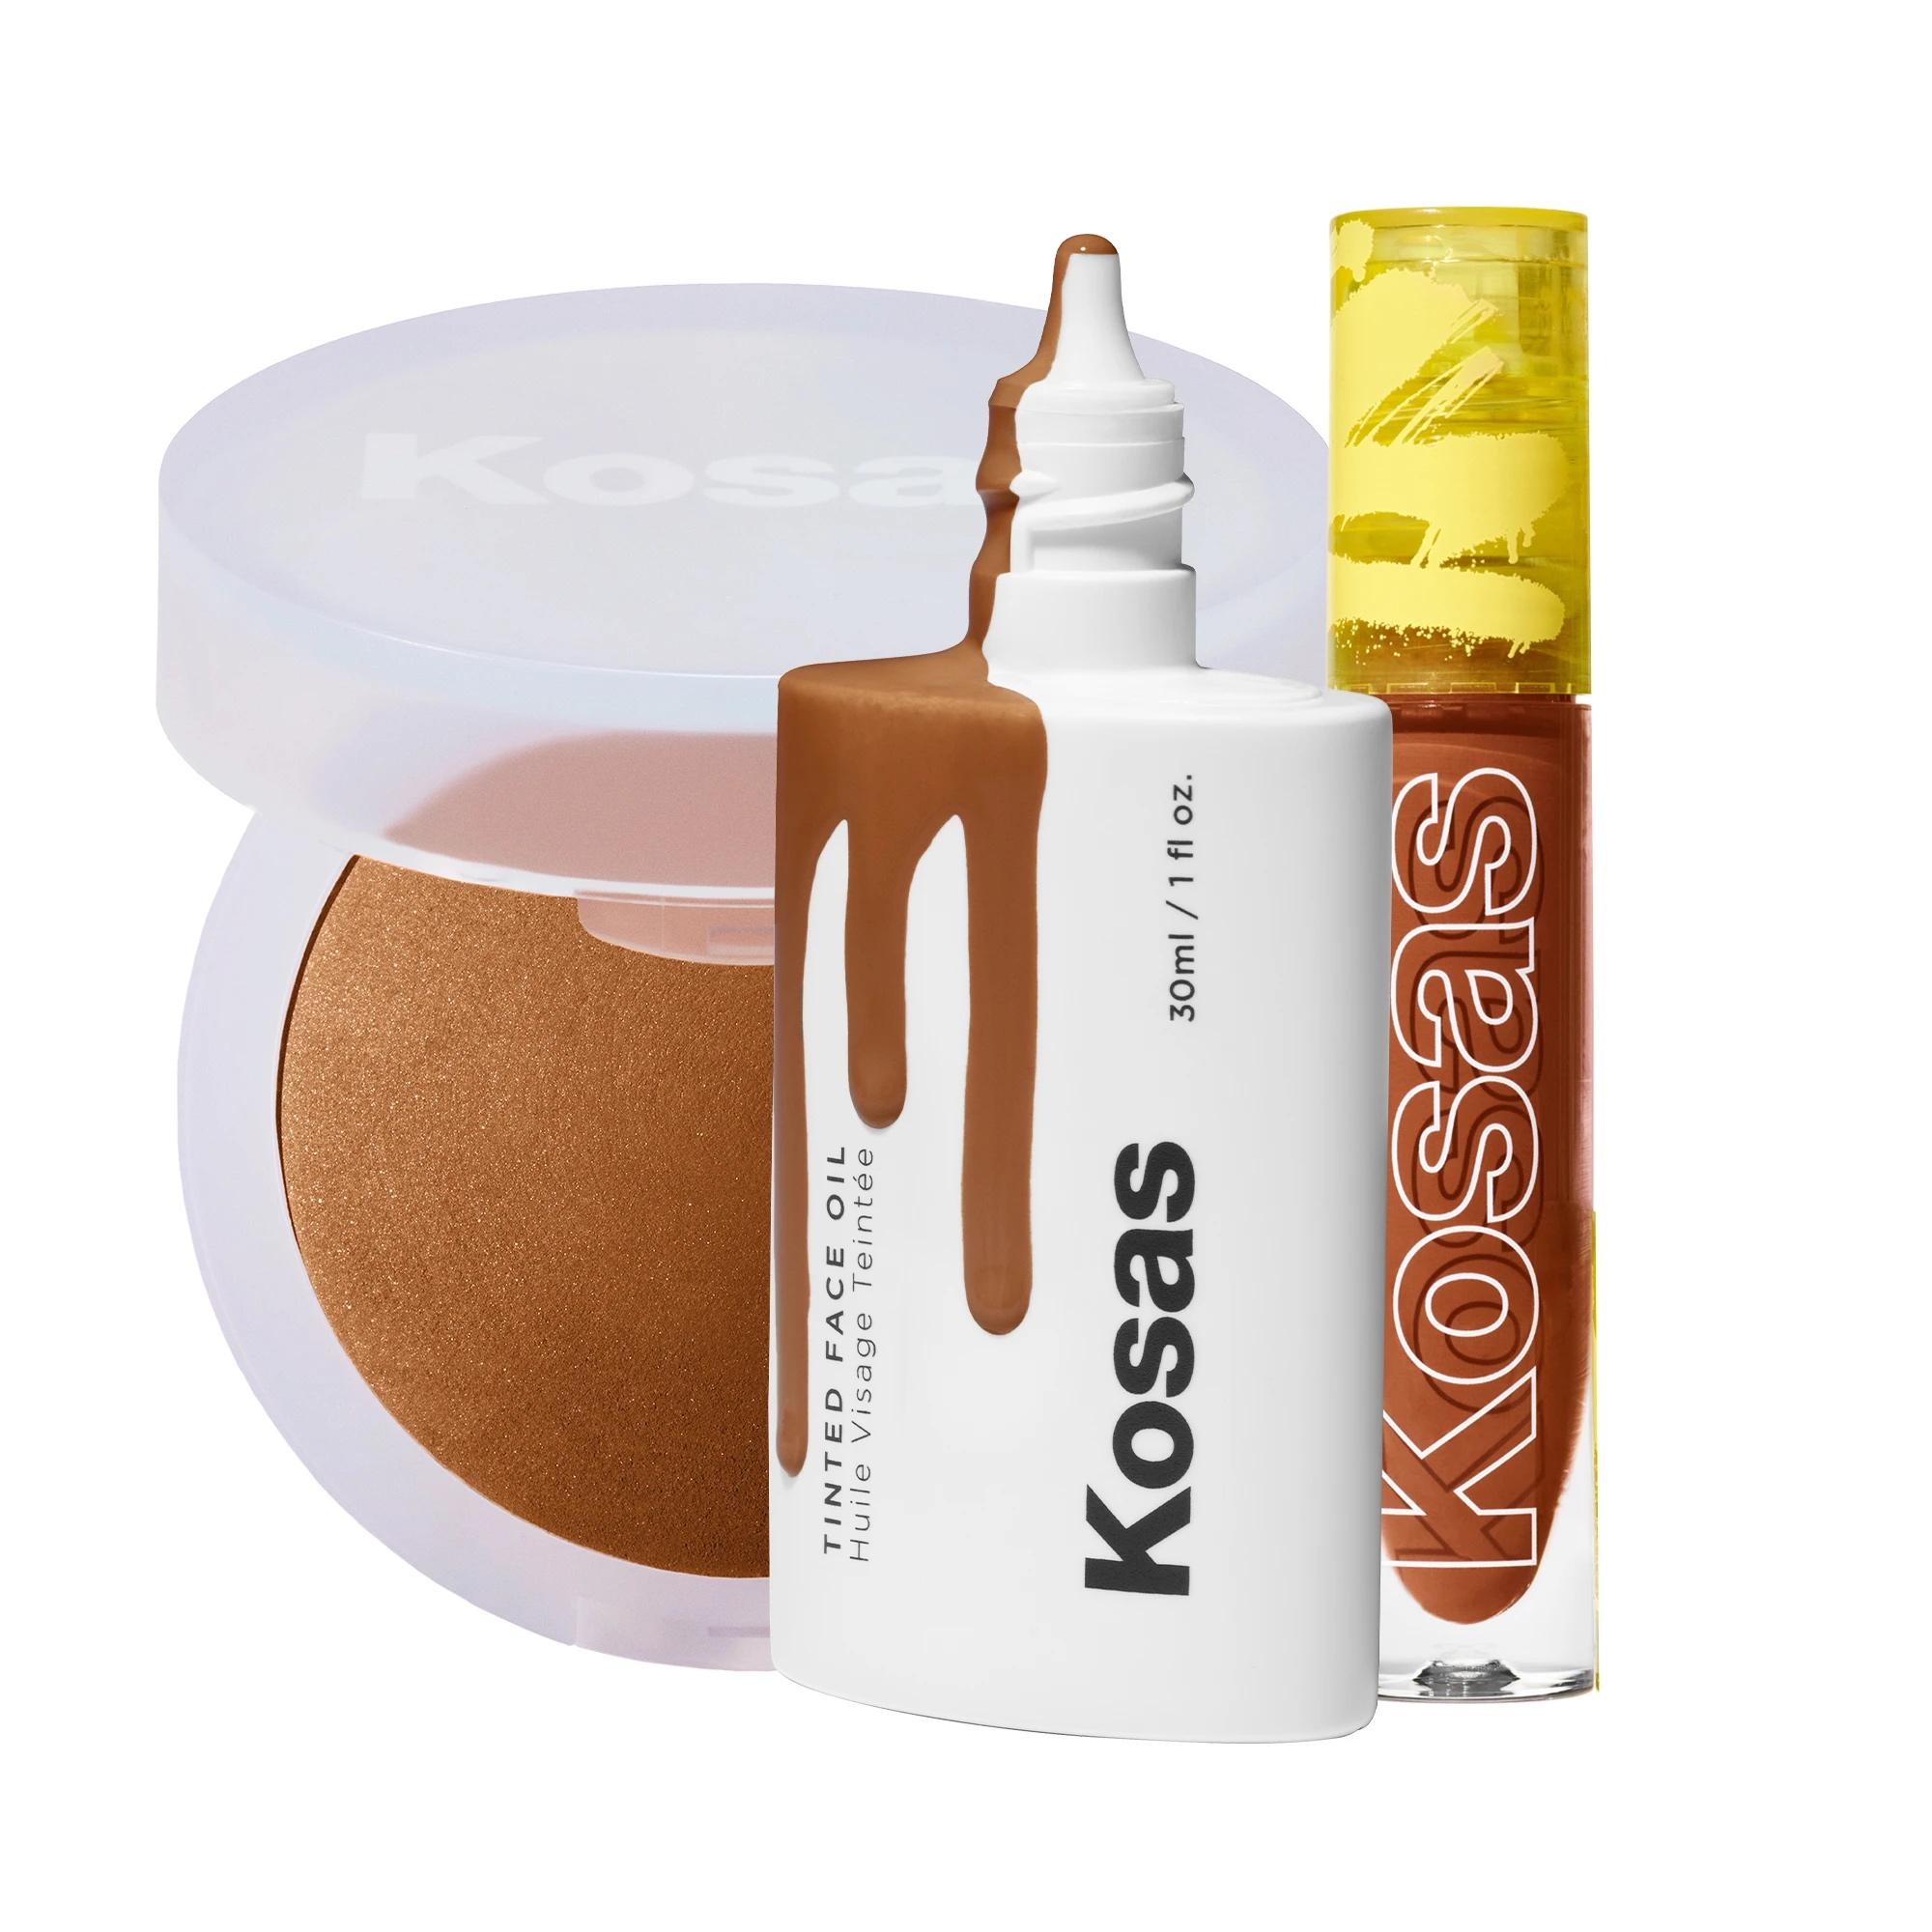 Día de la madre, skincare, maquillaje, Kosas